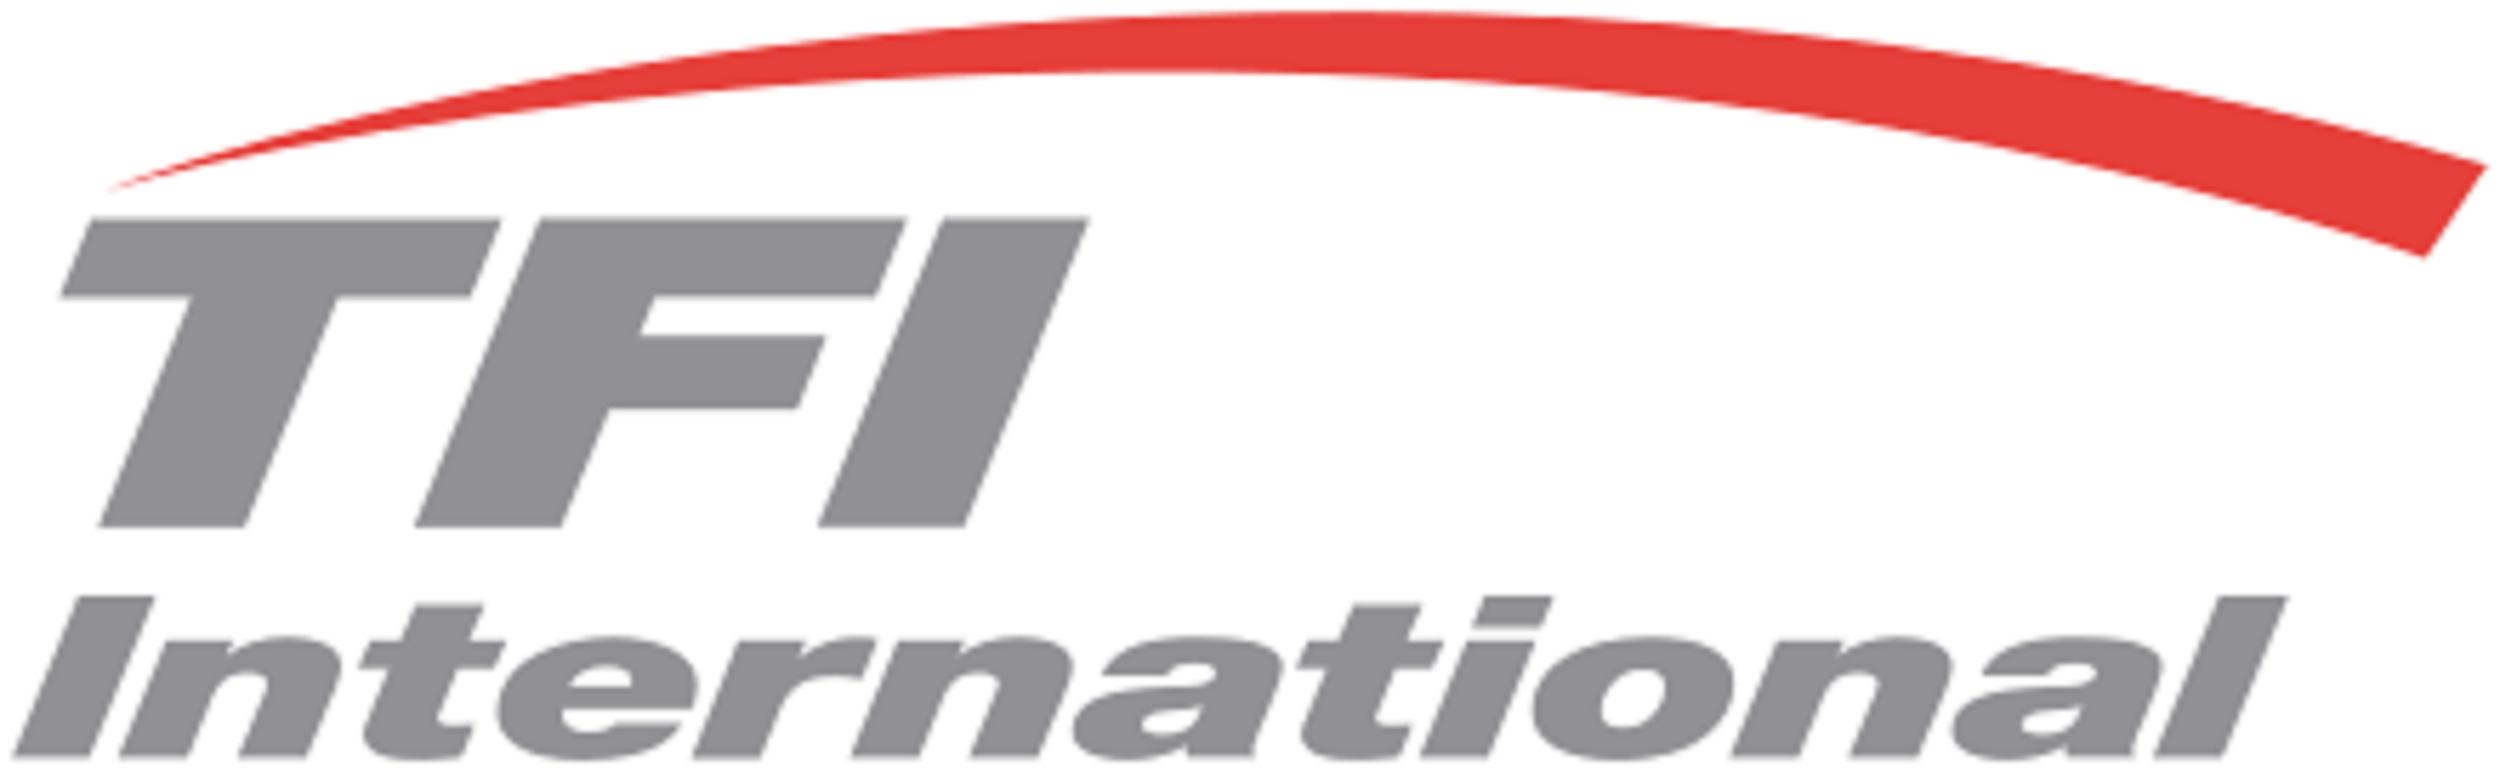 TFII logo